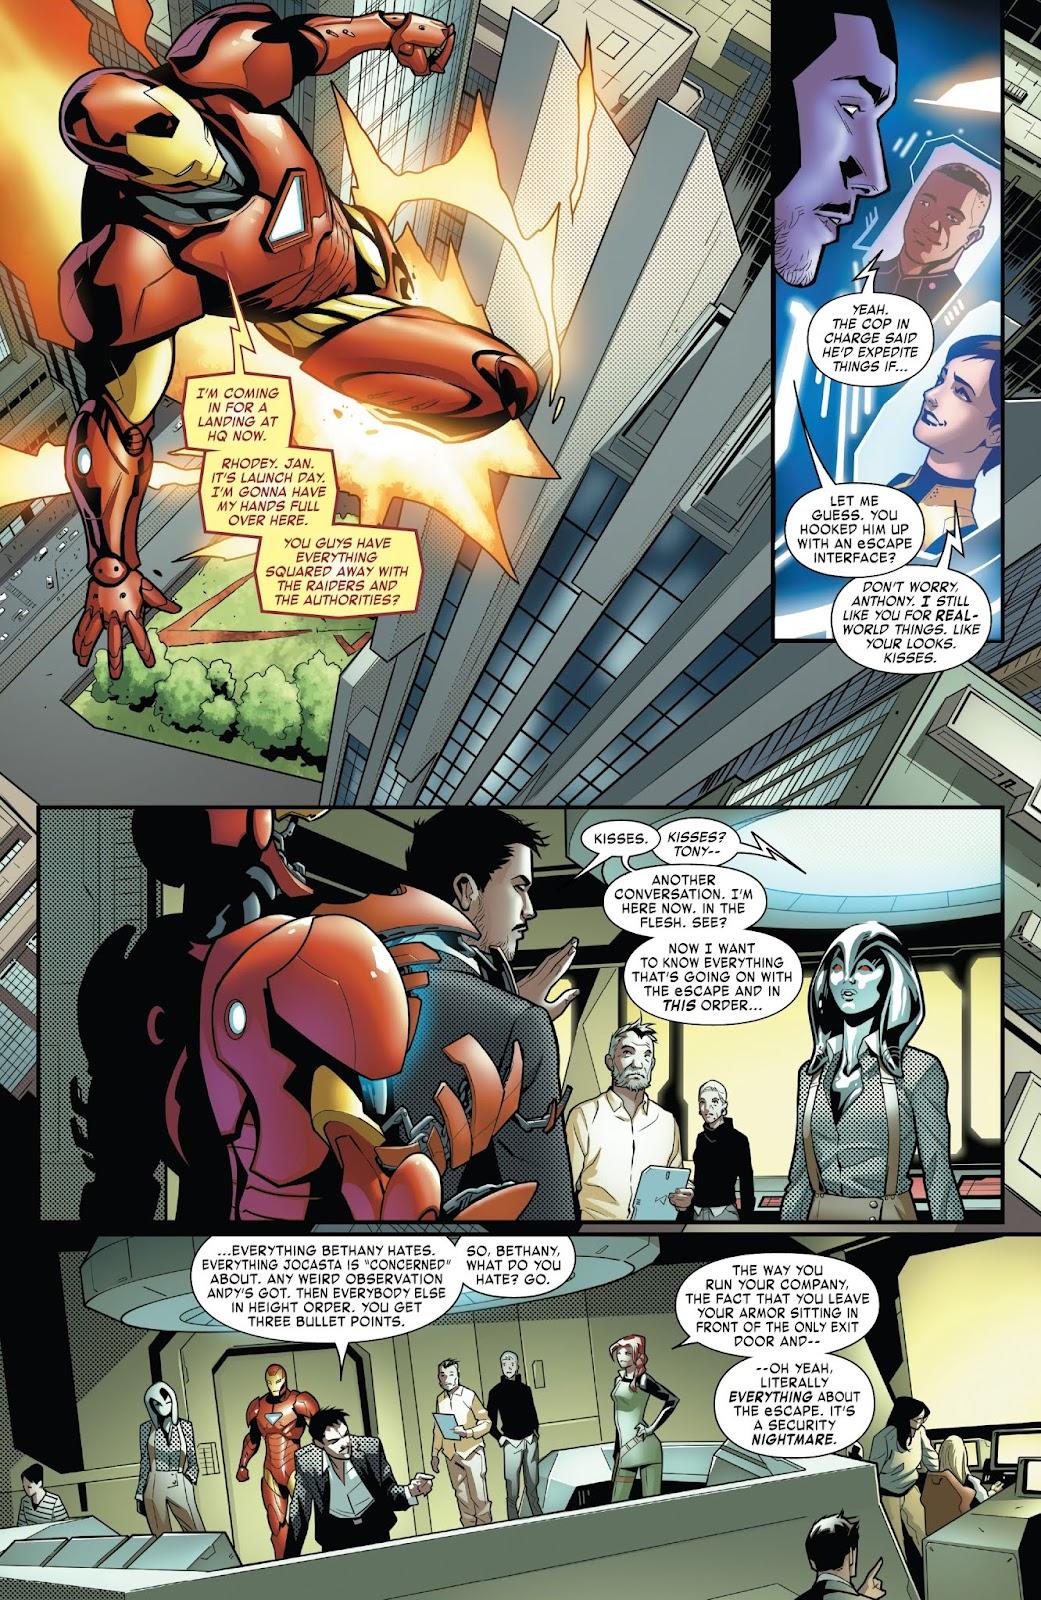 Read online Tony Stark: Iron Man comic -  Issue #6 - 12